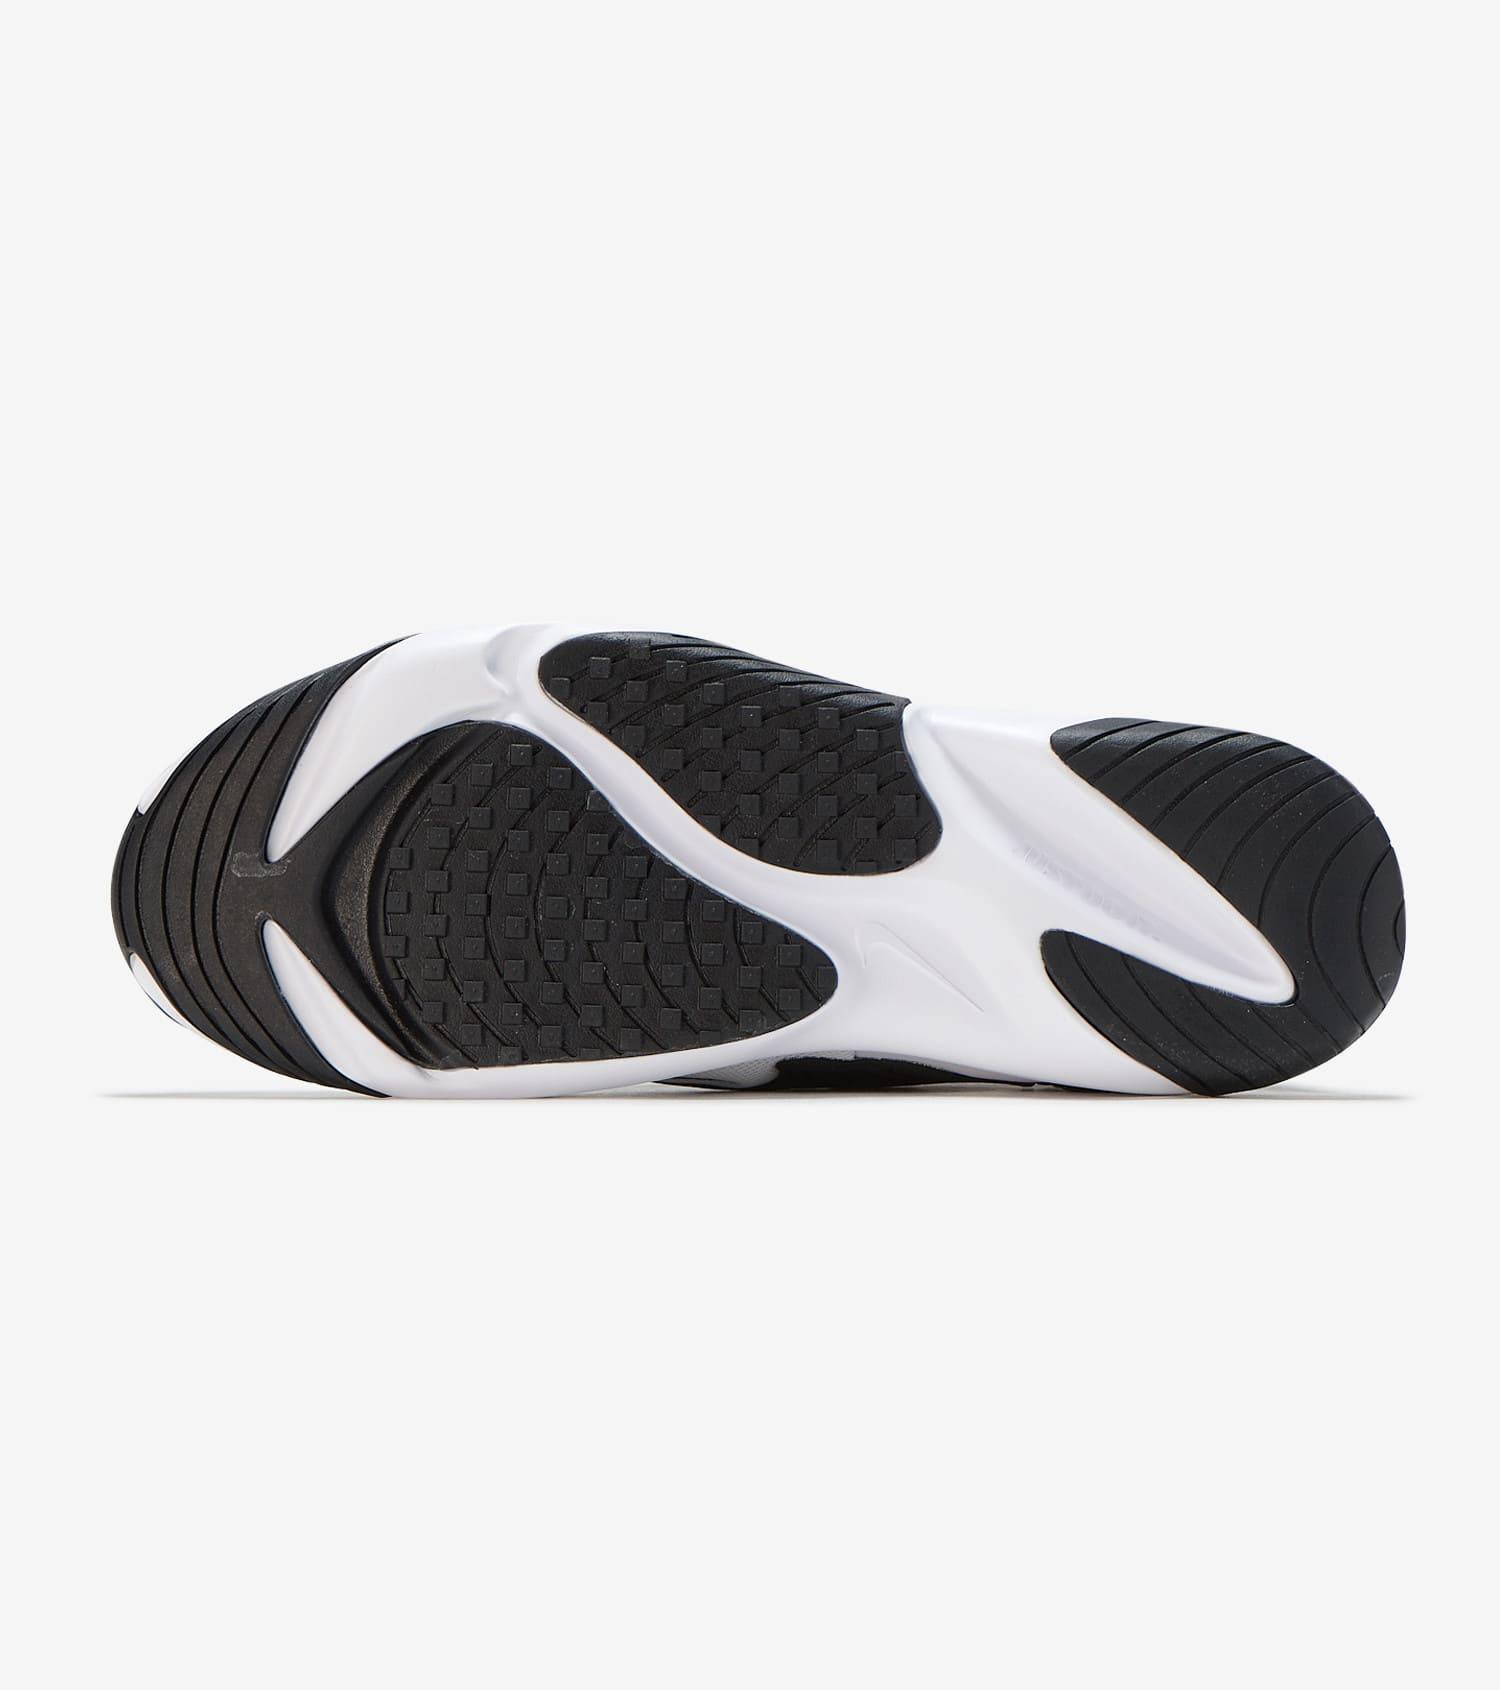 Details zu Nike Zoom 2K Sneaker Weiß Schwarz Herren Damen AO0269 101